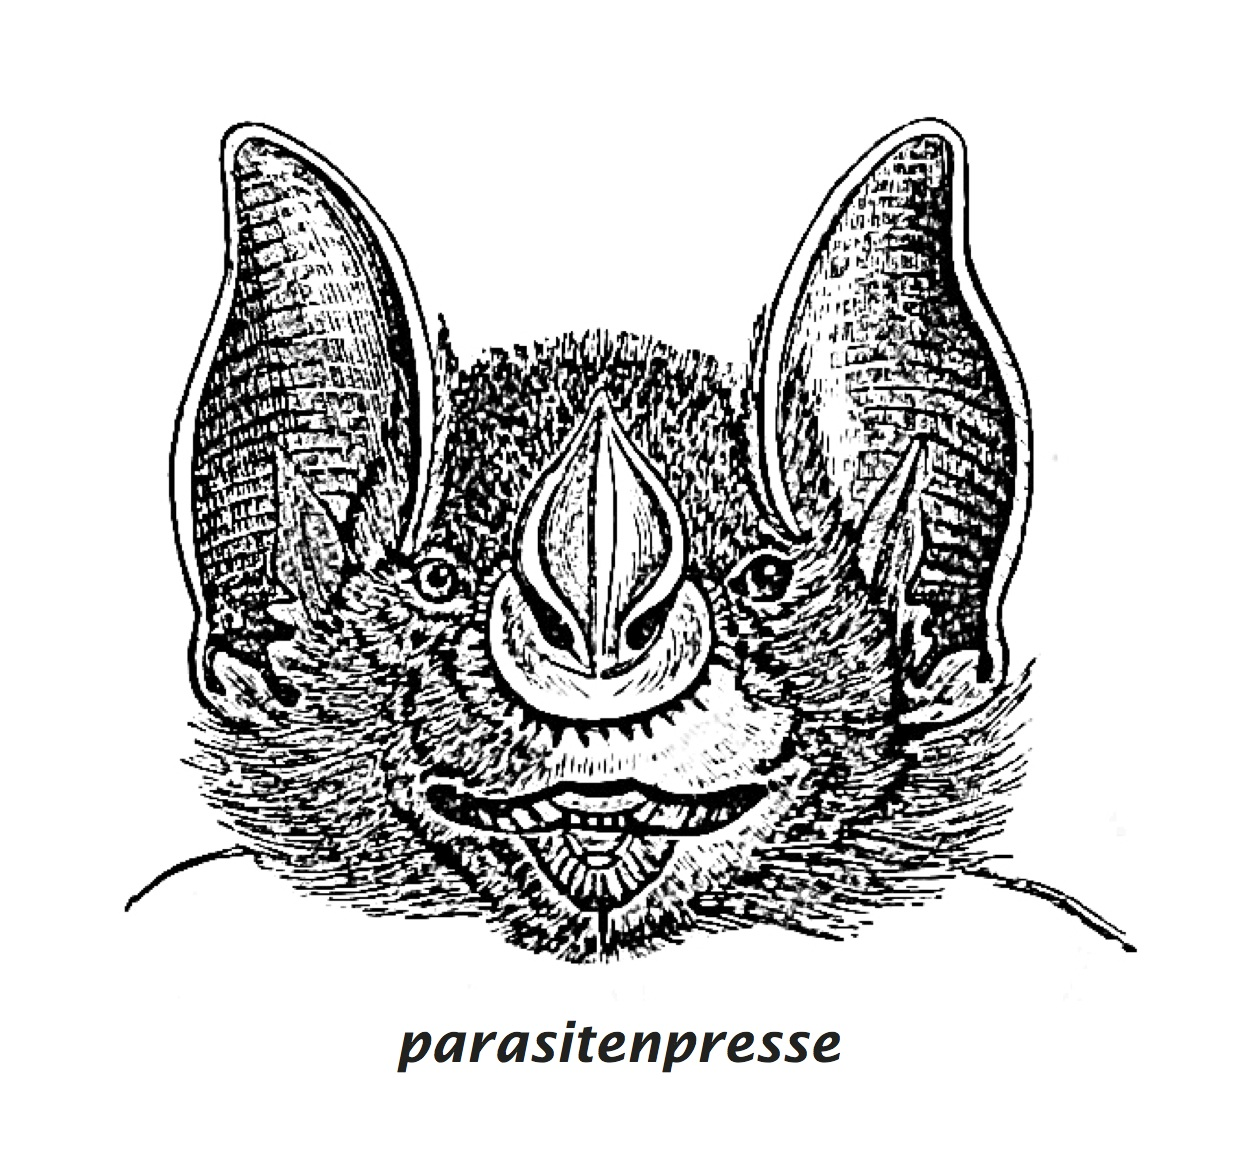 logo-parasitenpresse-fledermaus